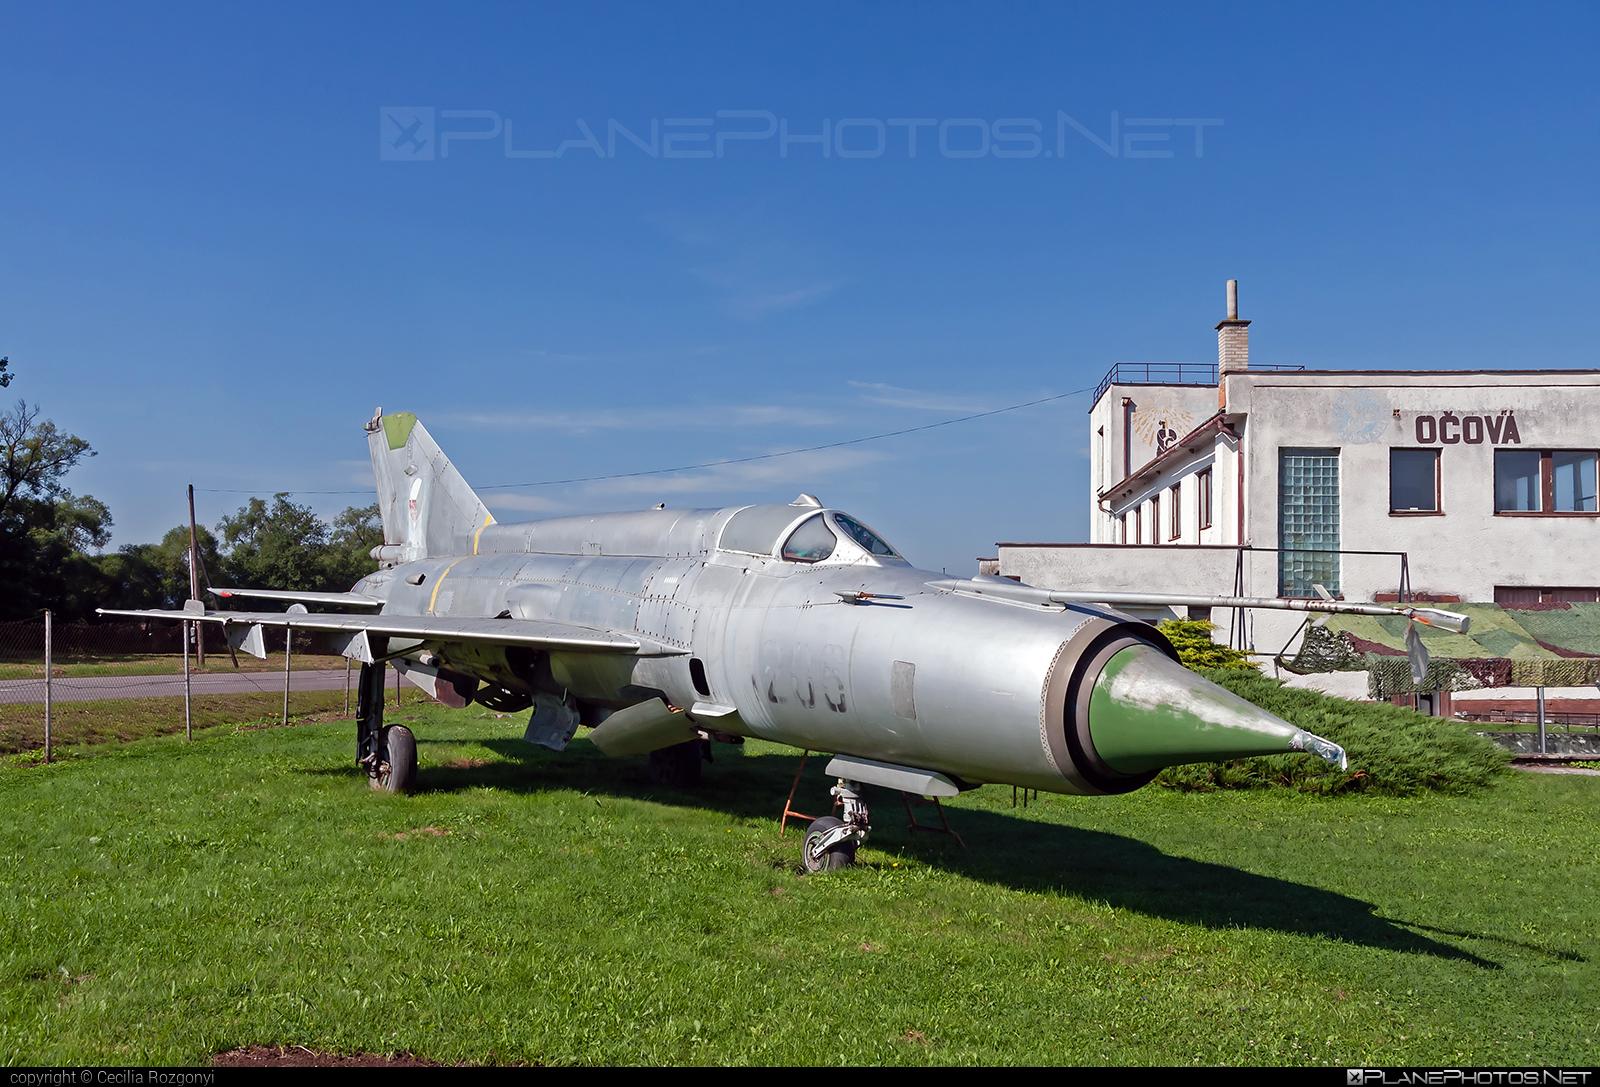 Mikoyan-Gurevich MiG-21MA - 1206 operated by Vzdušné sily OS SR (Slovak Air Force) #mig #mig21 #mig21ma #mikoyangurevich #slovakairforce #vzdusnesilyossr